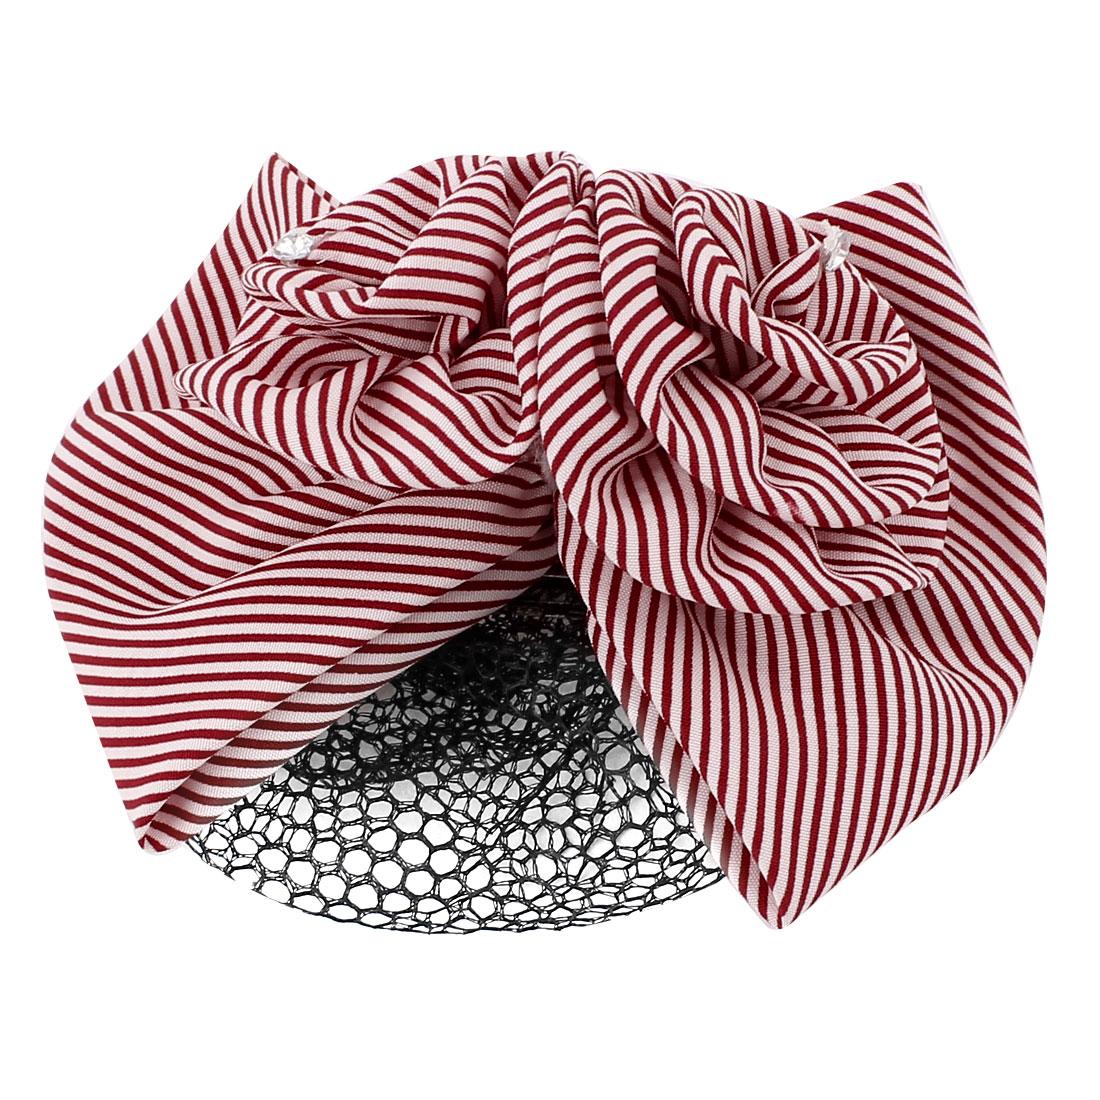 Women Bowknot Flower Decor Striped Bun Barrette Snood Net Hairclip Red White